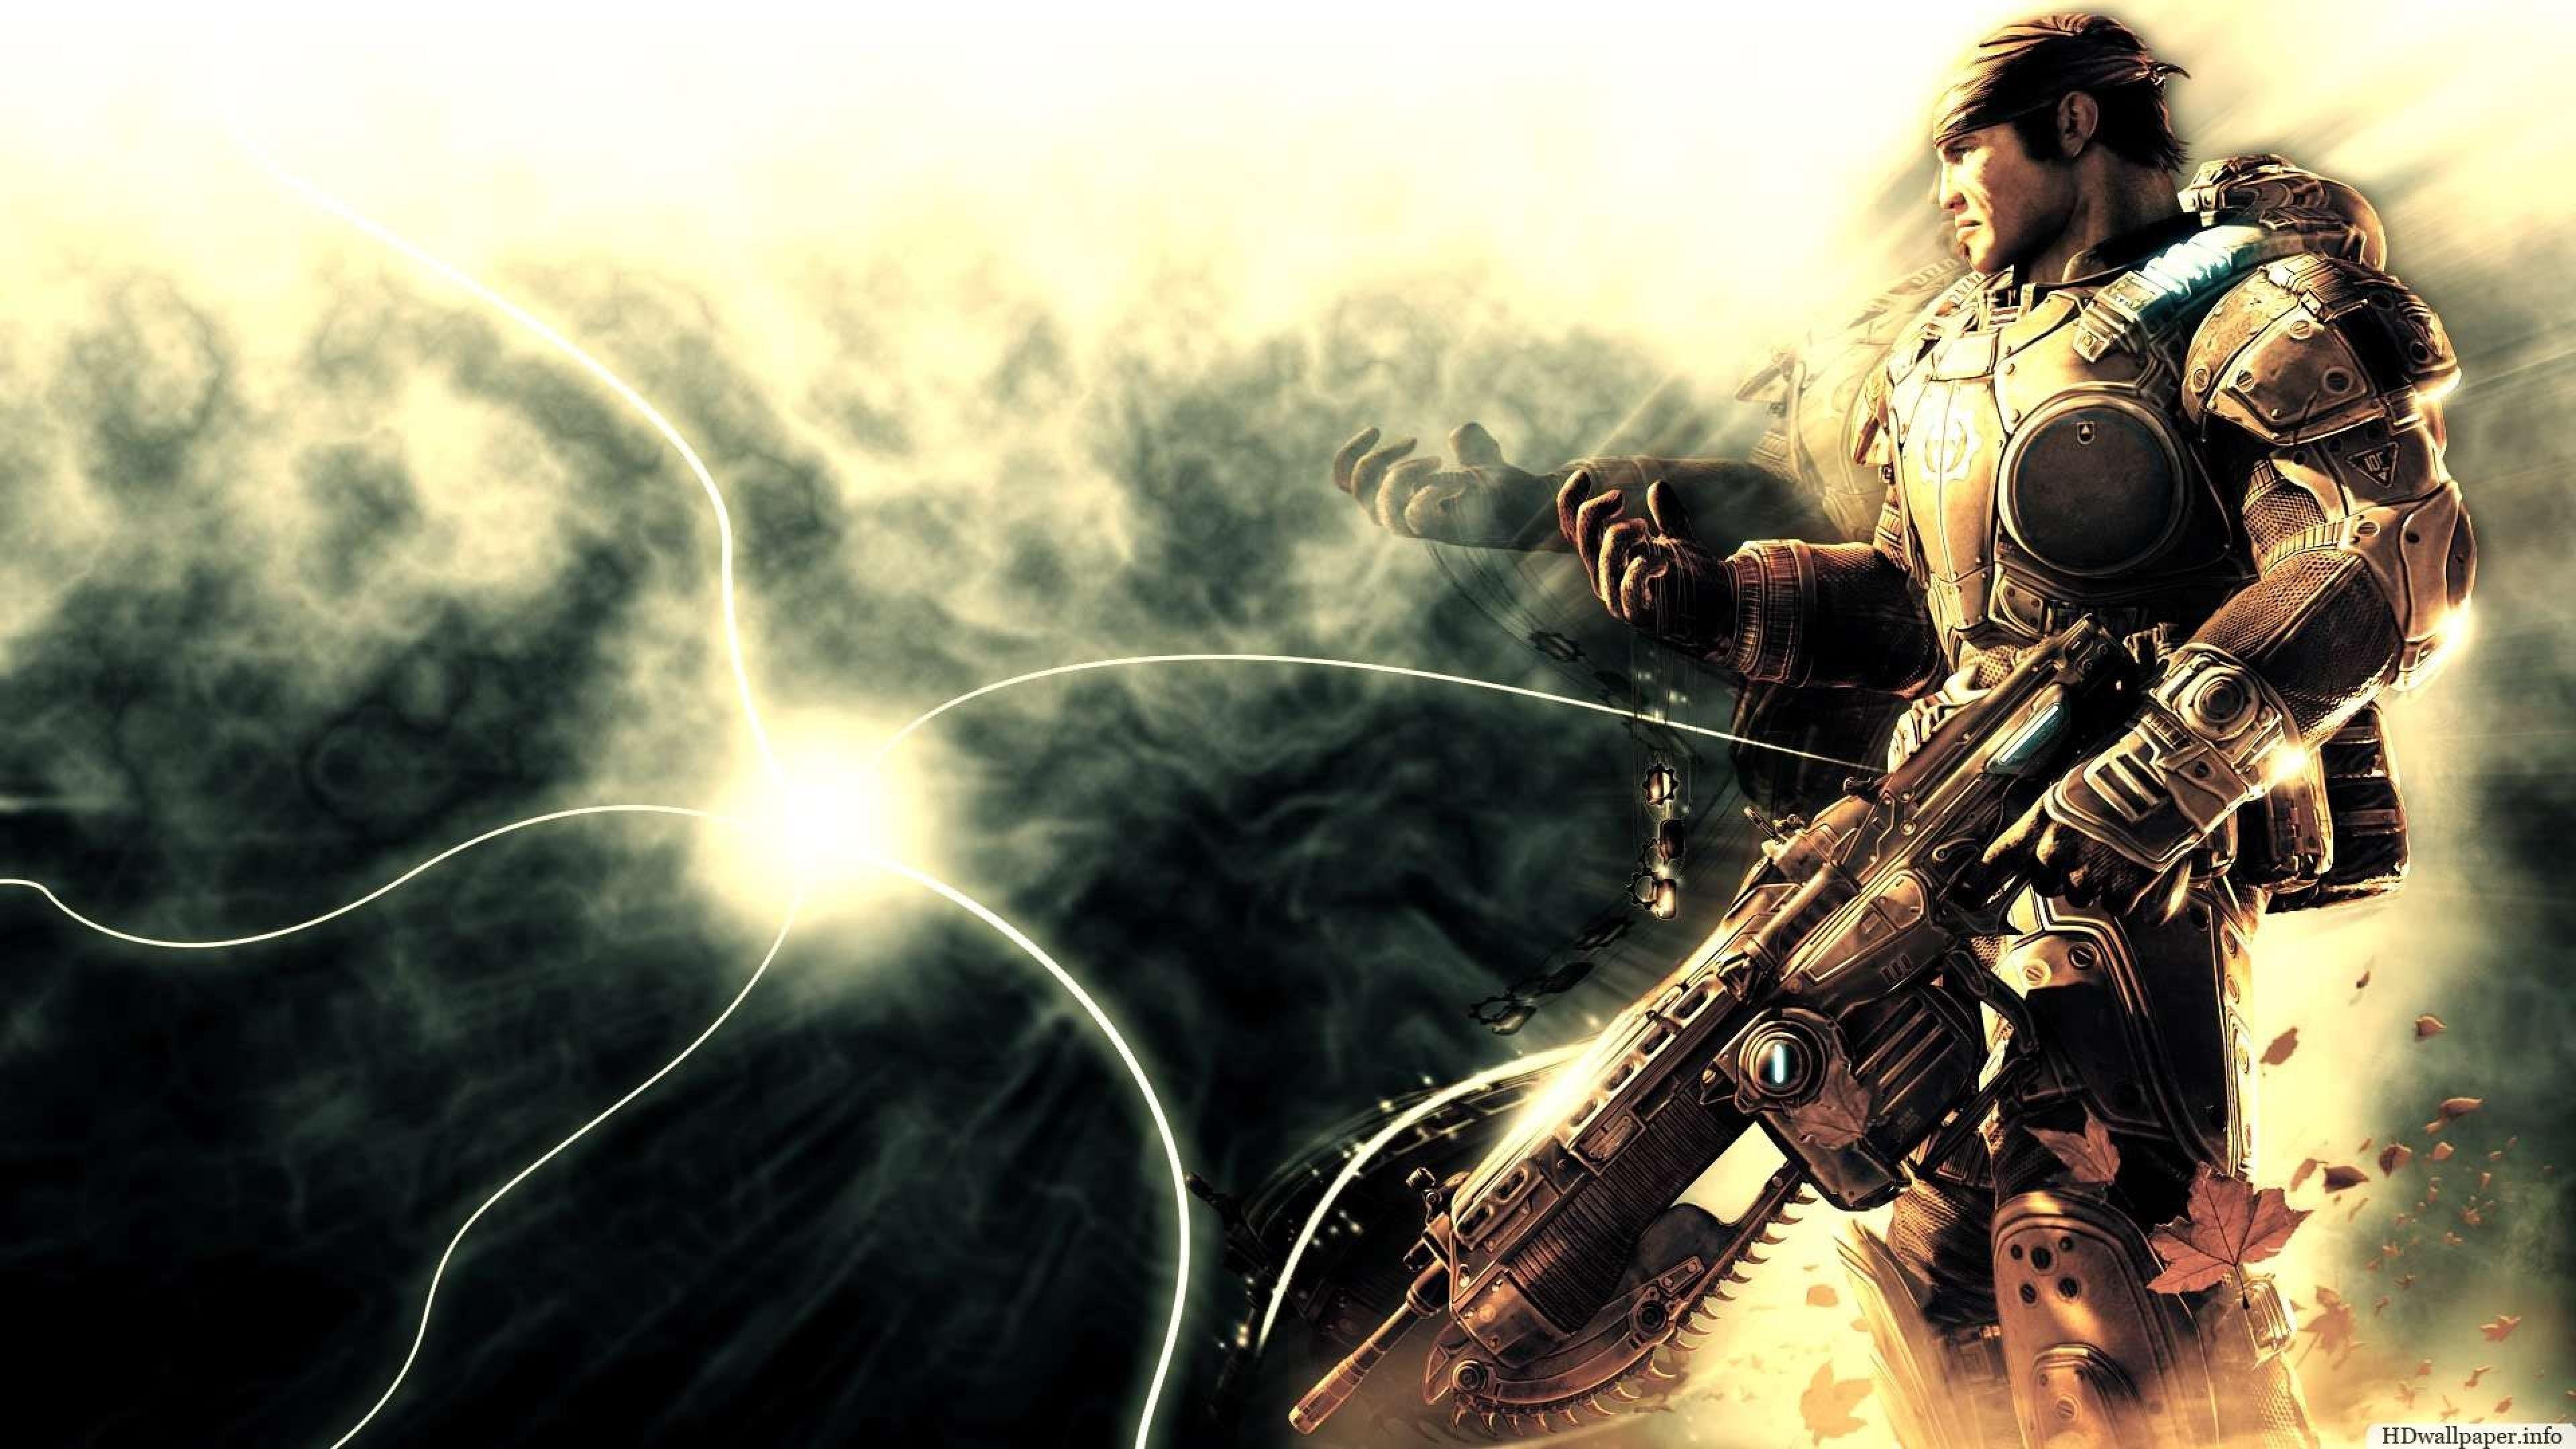 Best Video Game Wallpaper Hd